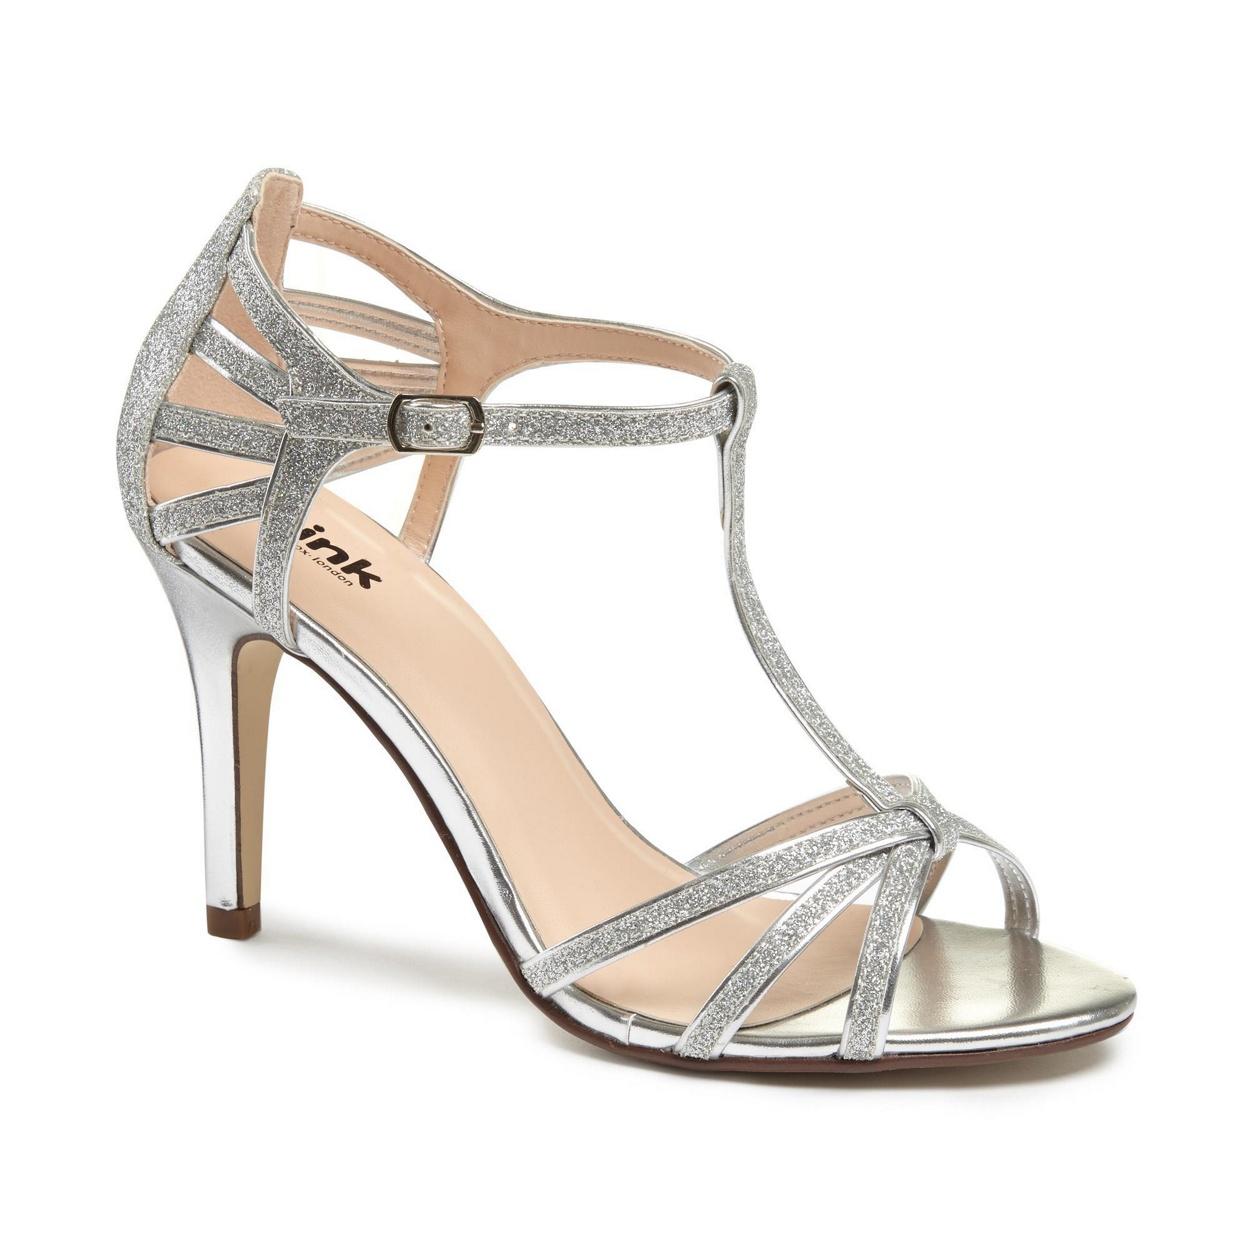 Black sandals debenhams - Pink By Paradox London Glitter Phoebe High Heel Stiletto T Bar Sandals